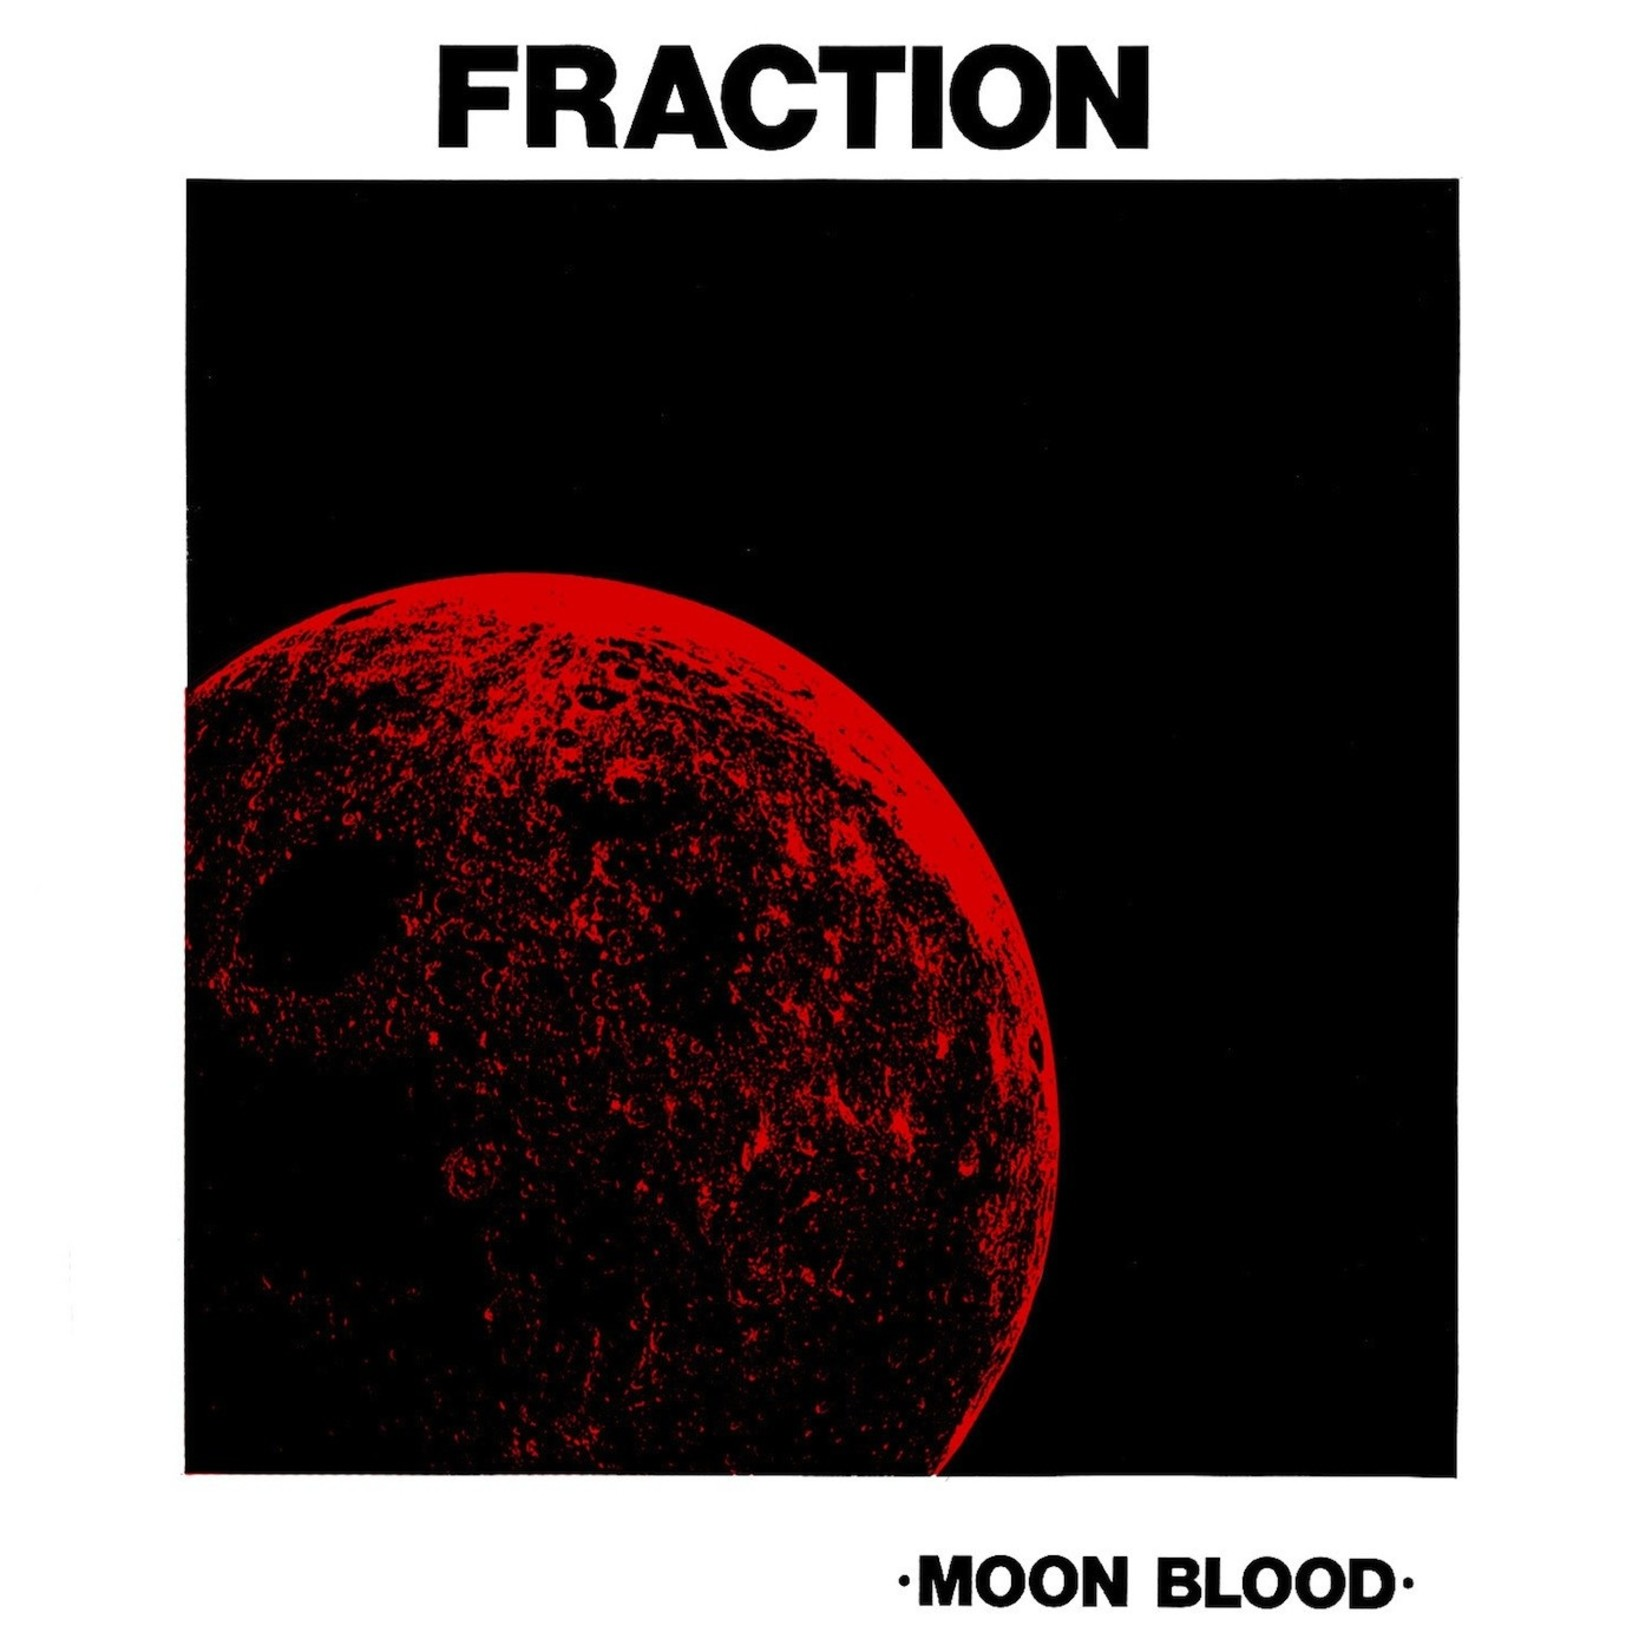 Vinyl Fraction - Moon Blood